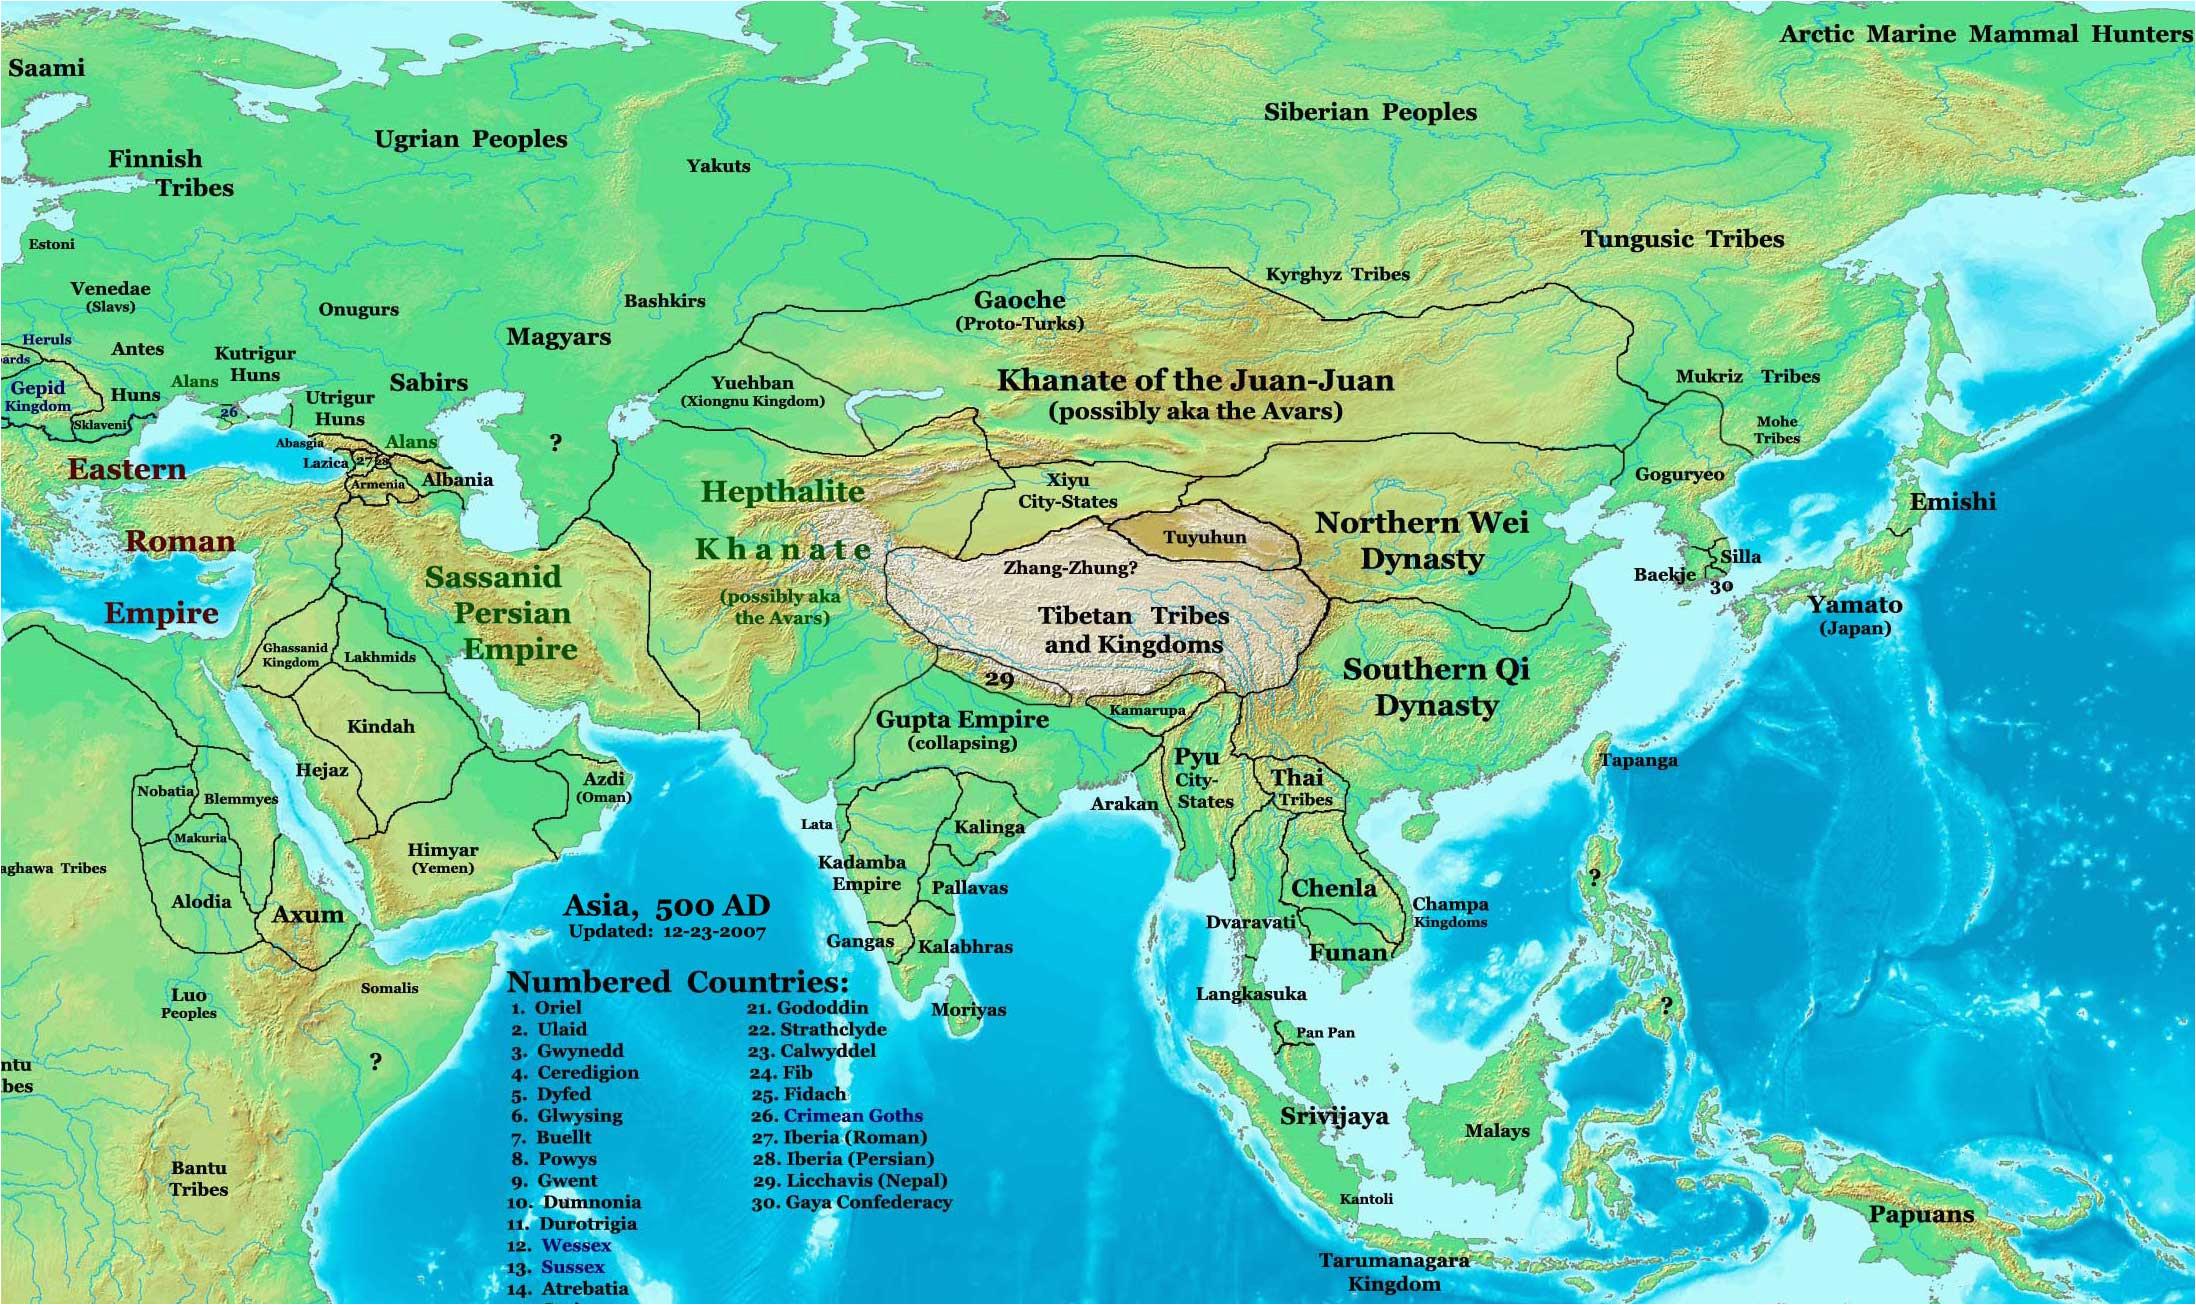 northern wei wikipedia